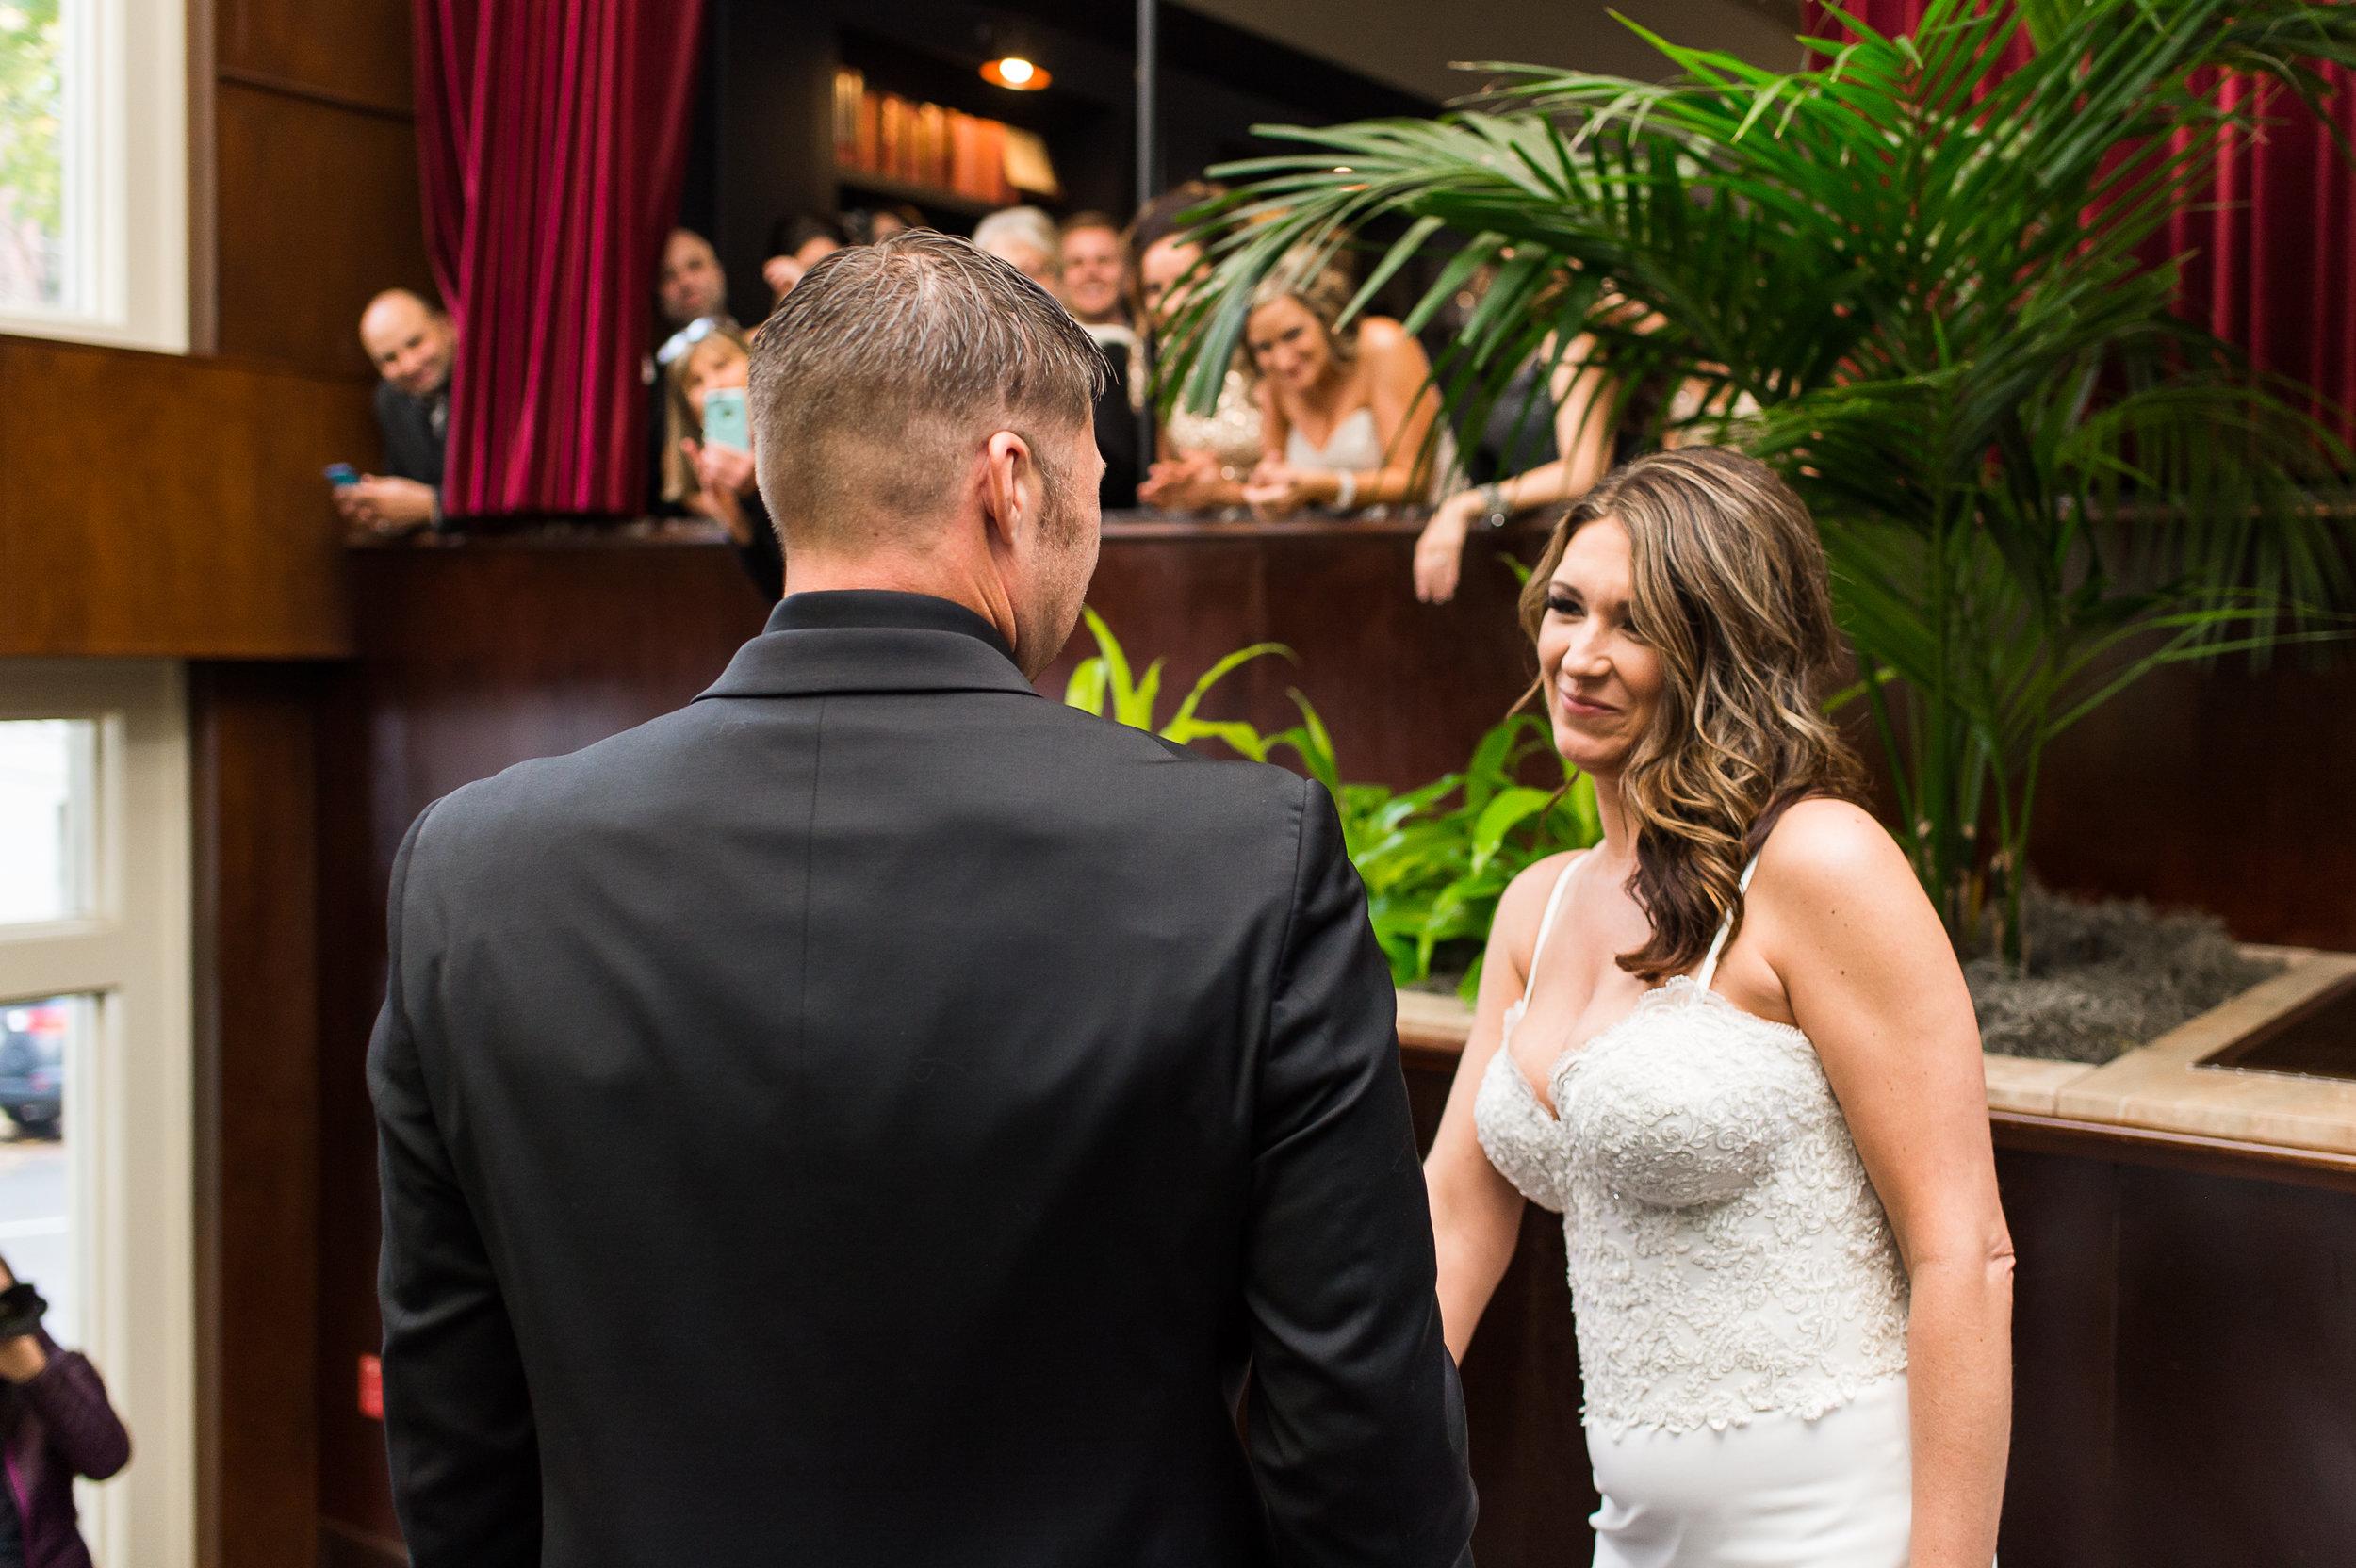 JJ-wedding-Van-Wyhe-Photography-118.jpg